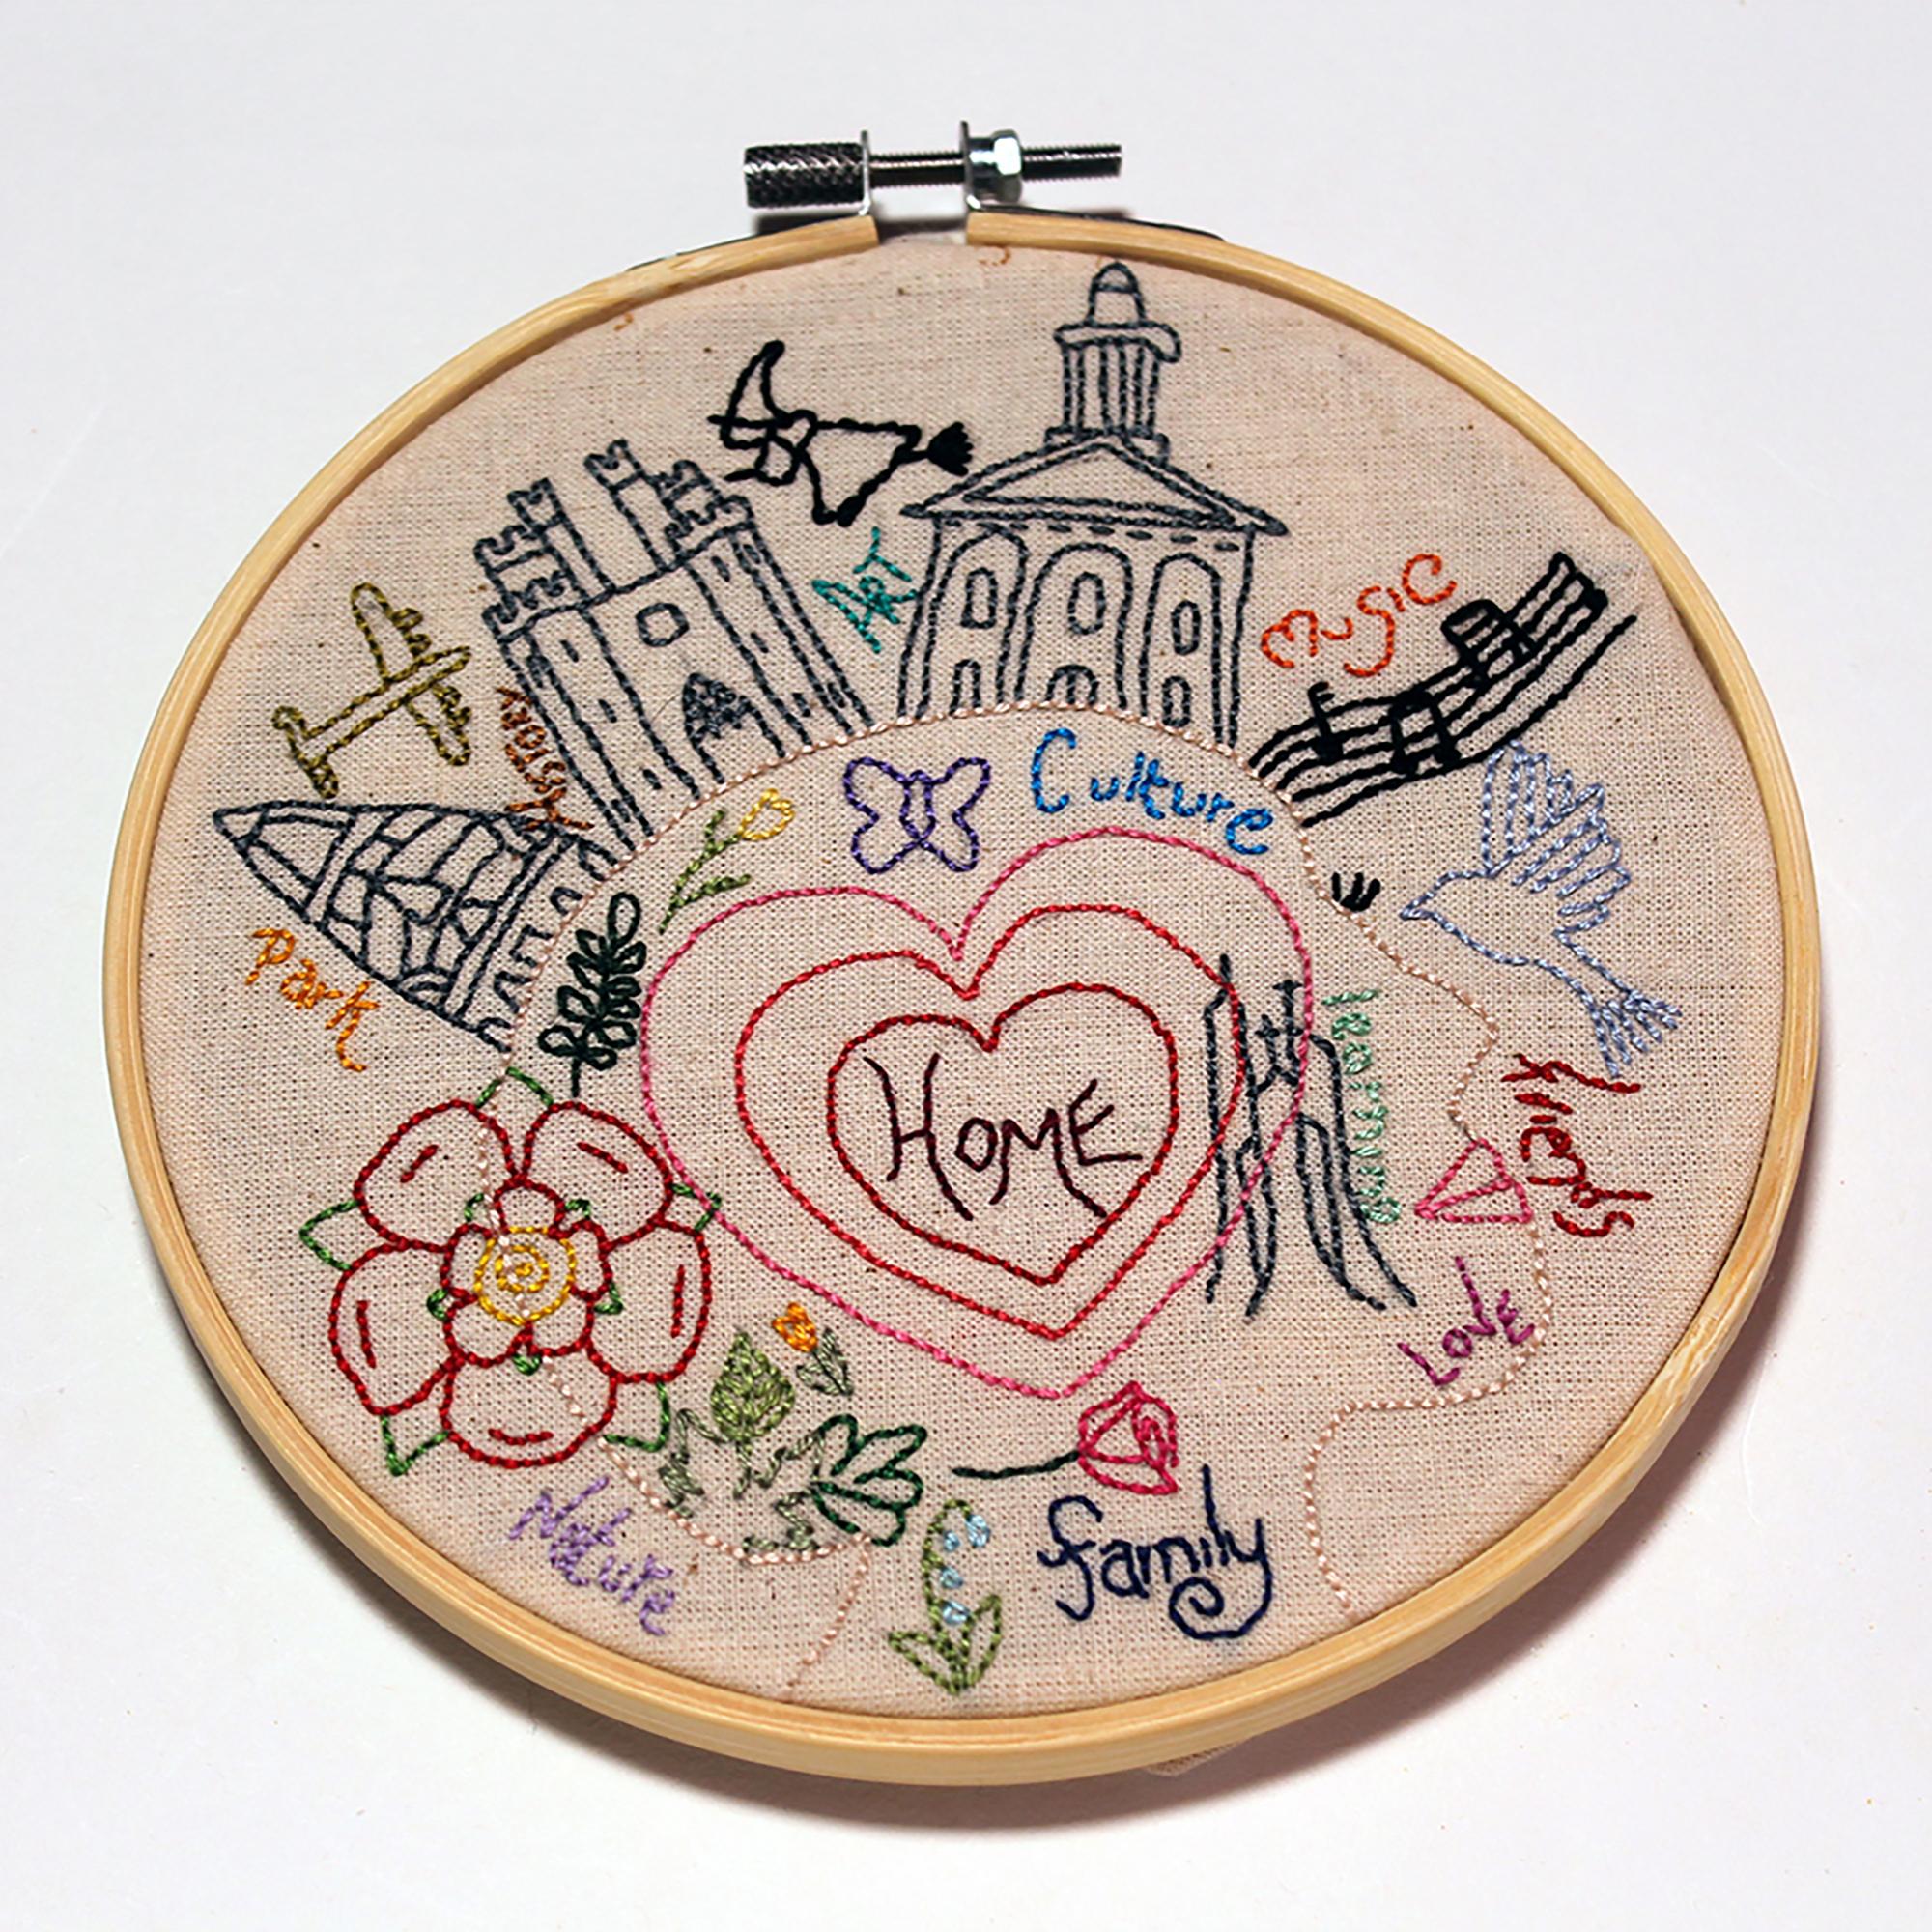 Tamzin Birchall - #stitchyourstory